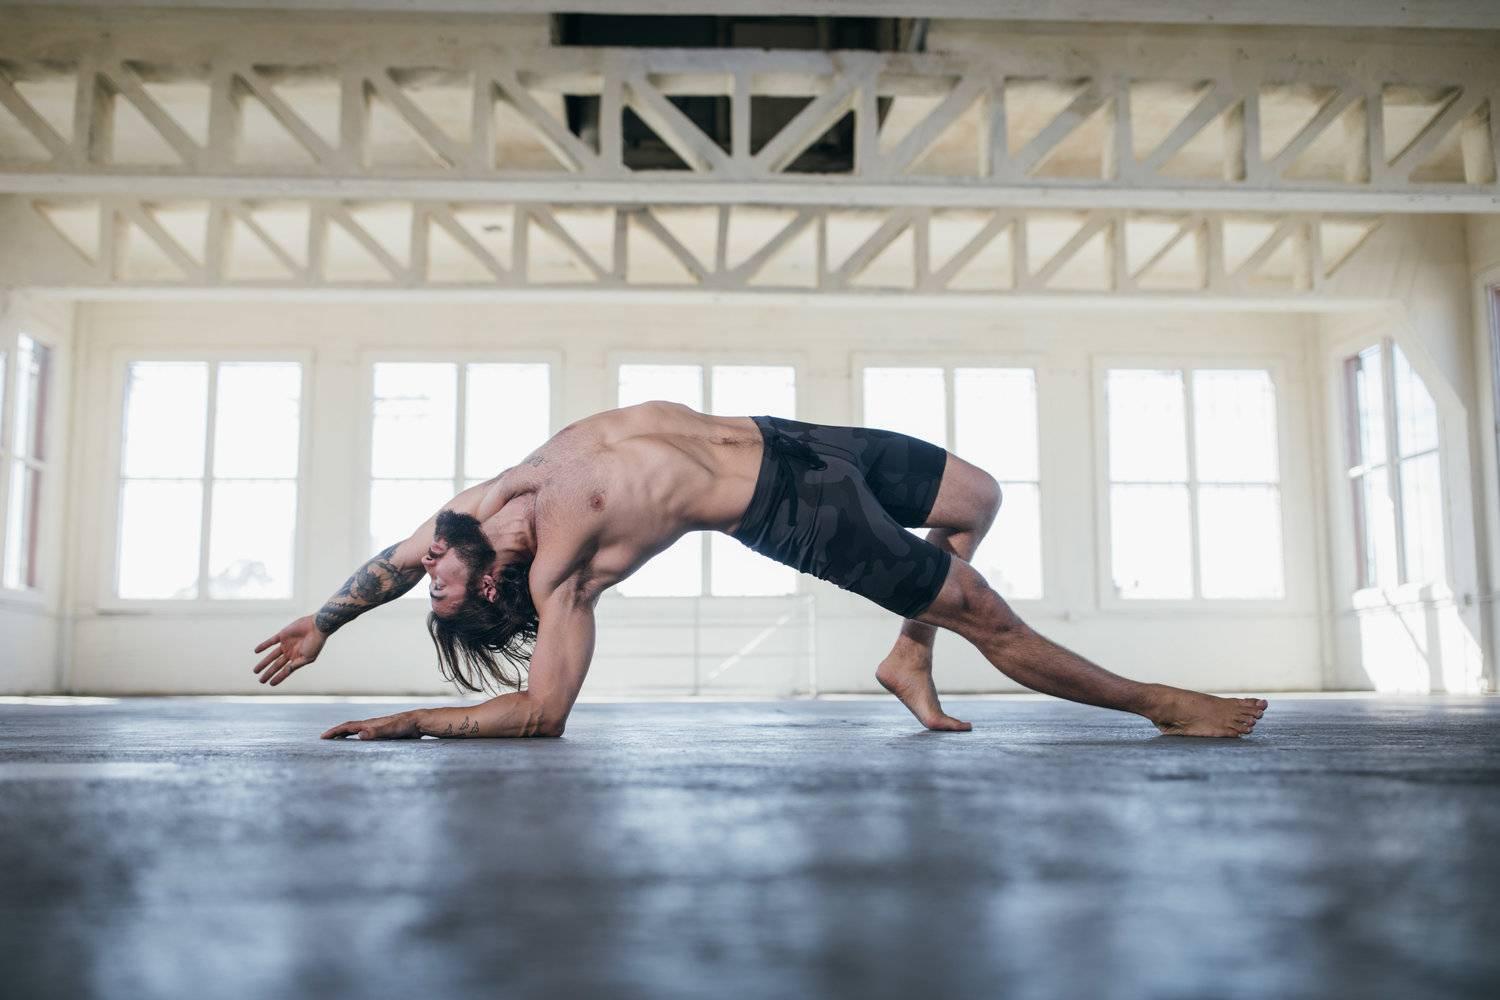 Что такое боевая йога: практика, гимнастика и единоборство — vyshen.ru — онлайн журнал